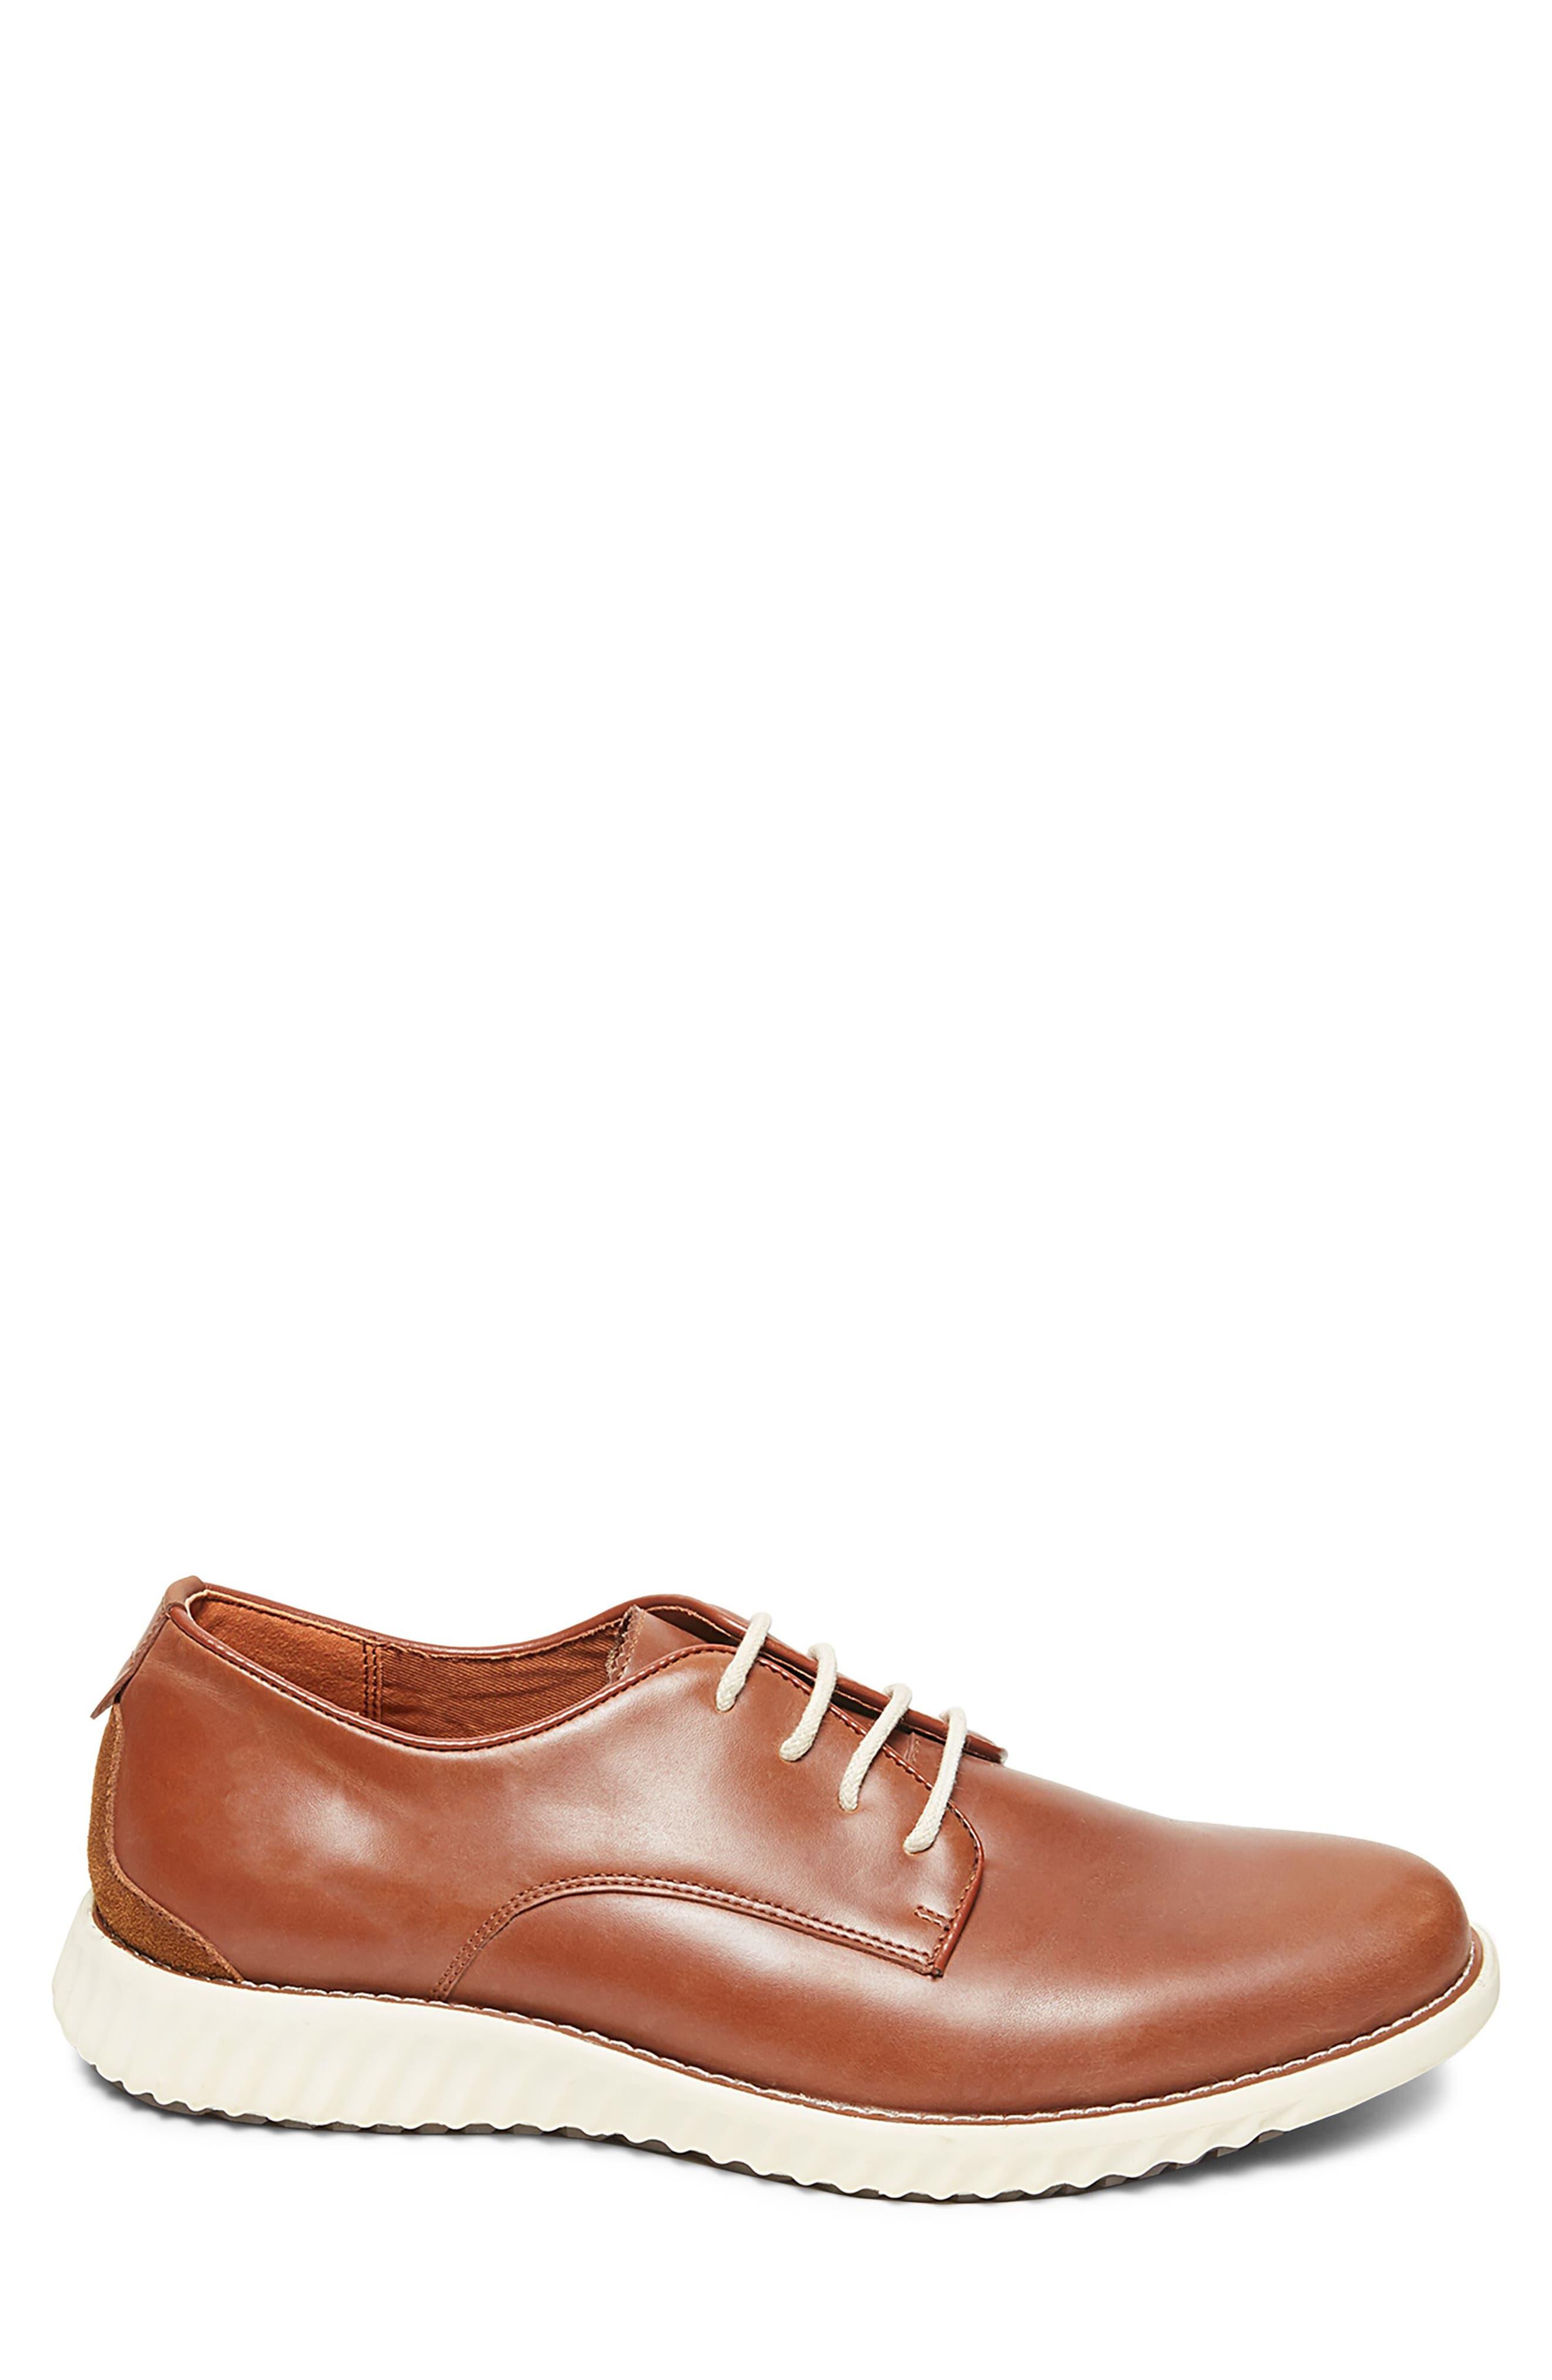 Vance Sneaker,                             Alternate thumbnail 3, color,                             Tan